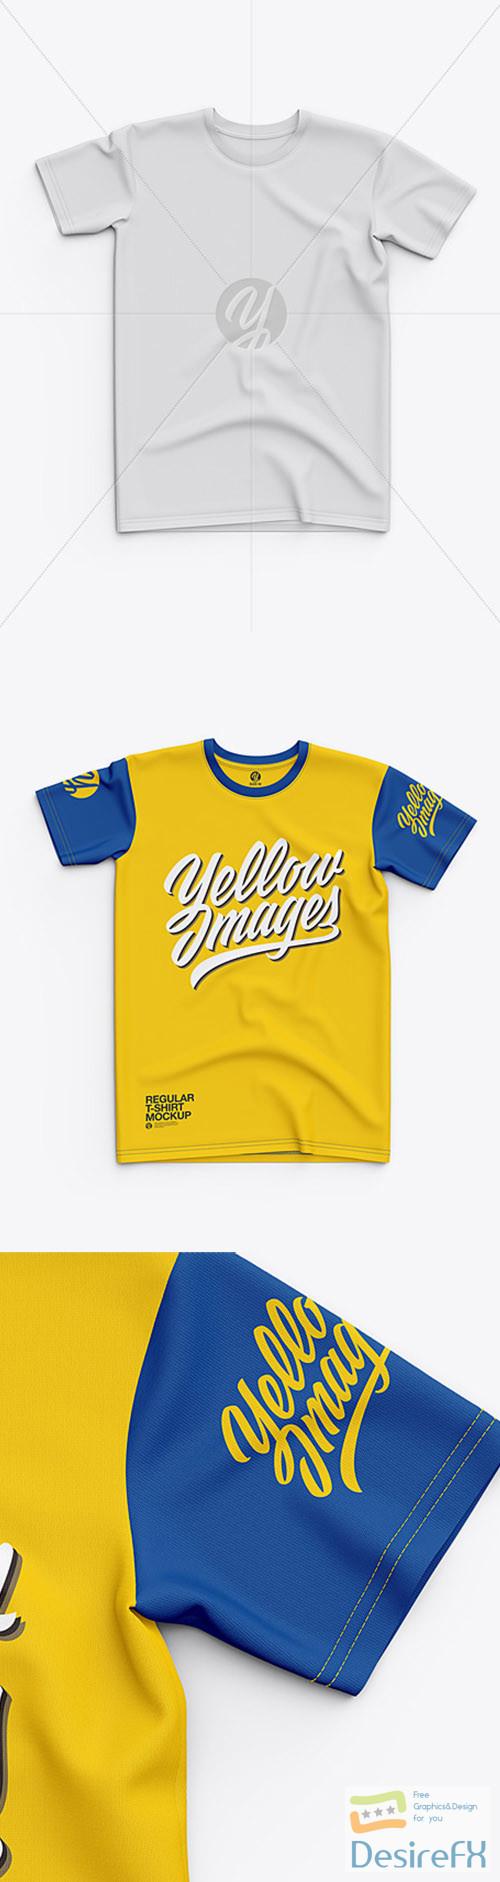 t-shirts-prints - Mens Classic Regular T-Shirt - Top View 30237 TIF